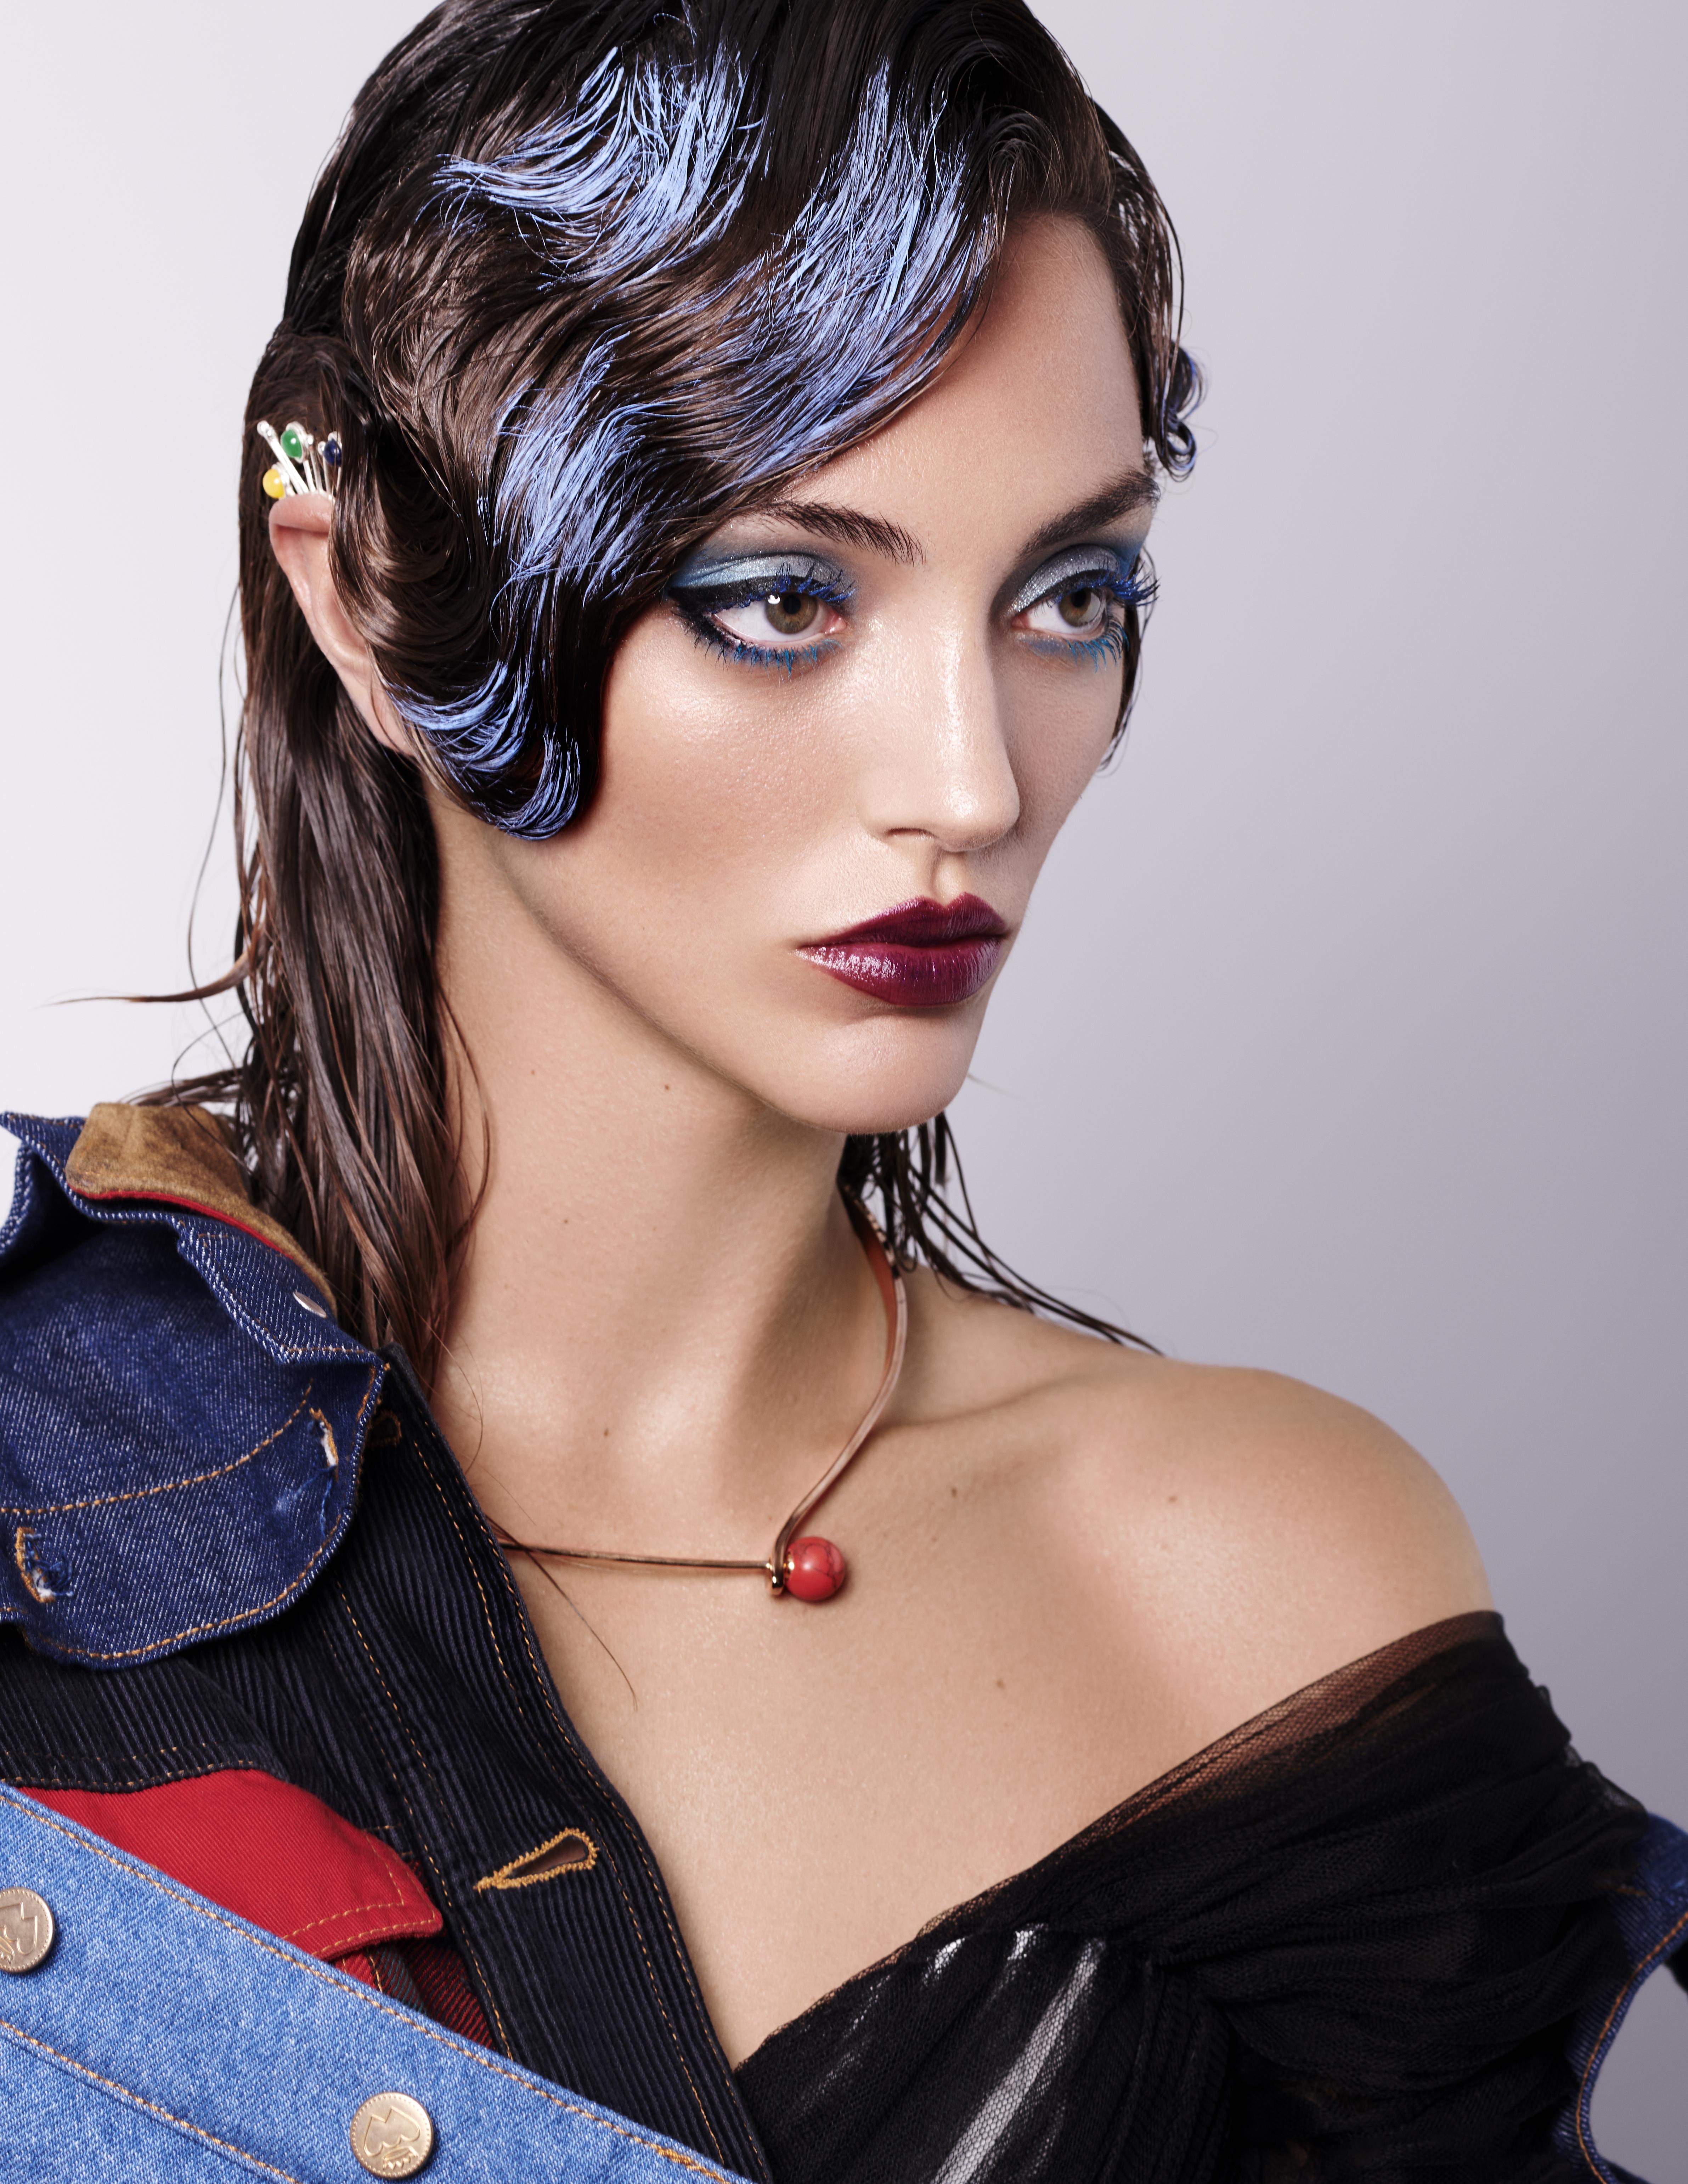 Pirate Punk-tastic Harper's Bazaar